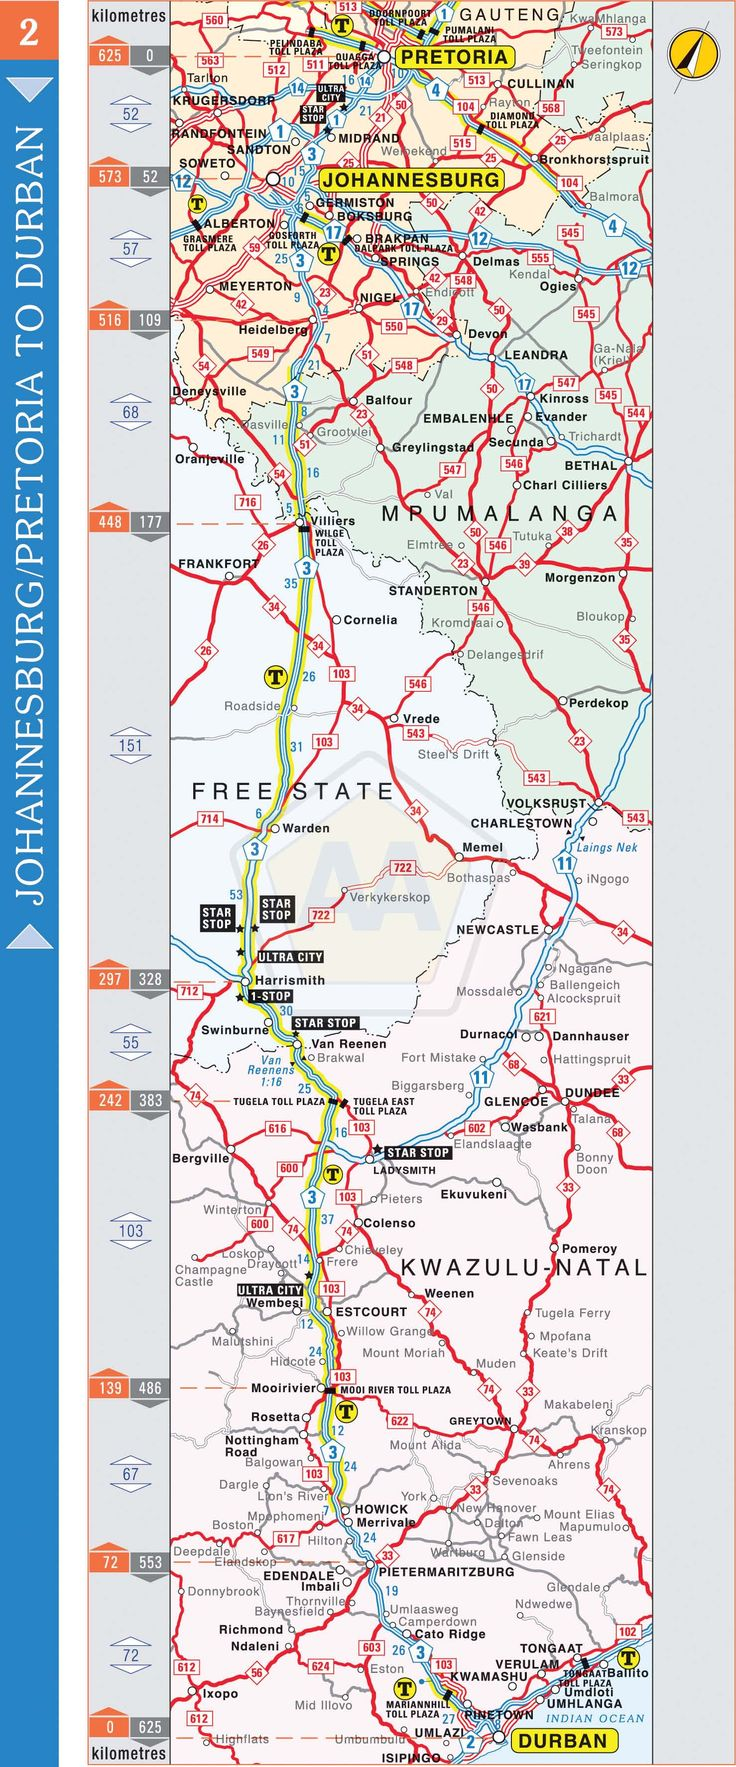 Johannesburg / Pretoria to Durban | Automobile Association